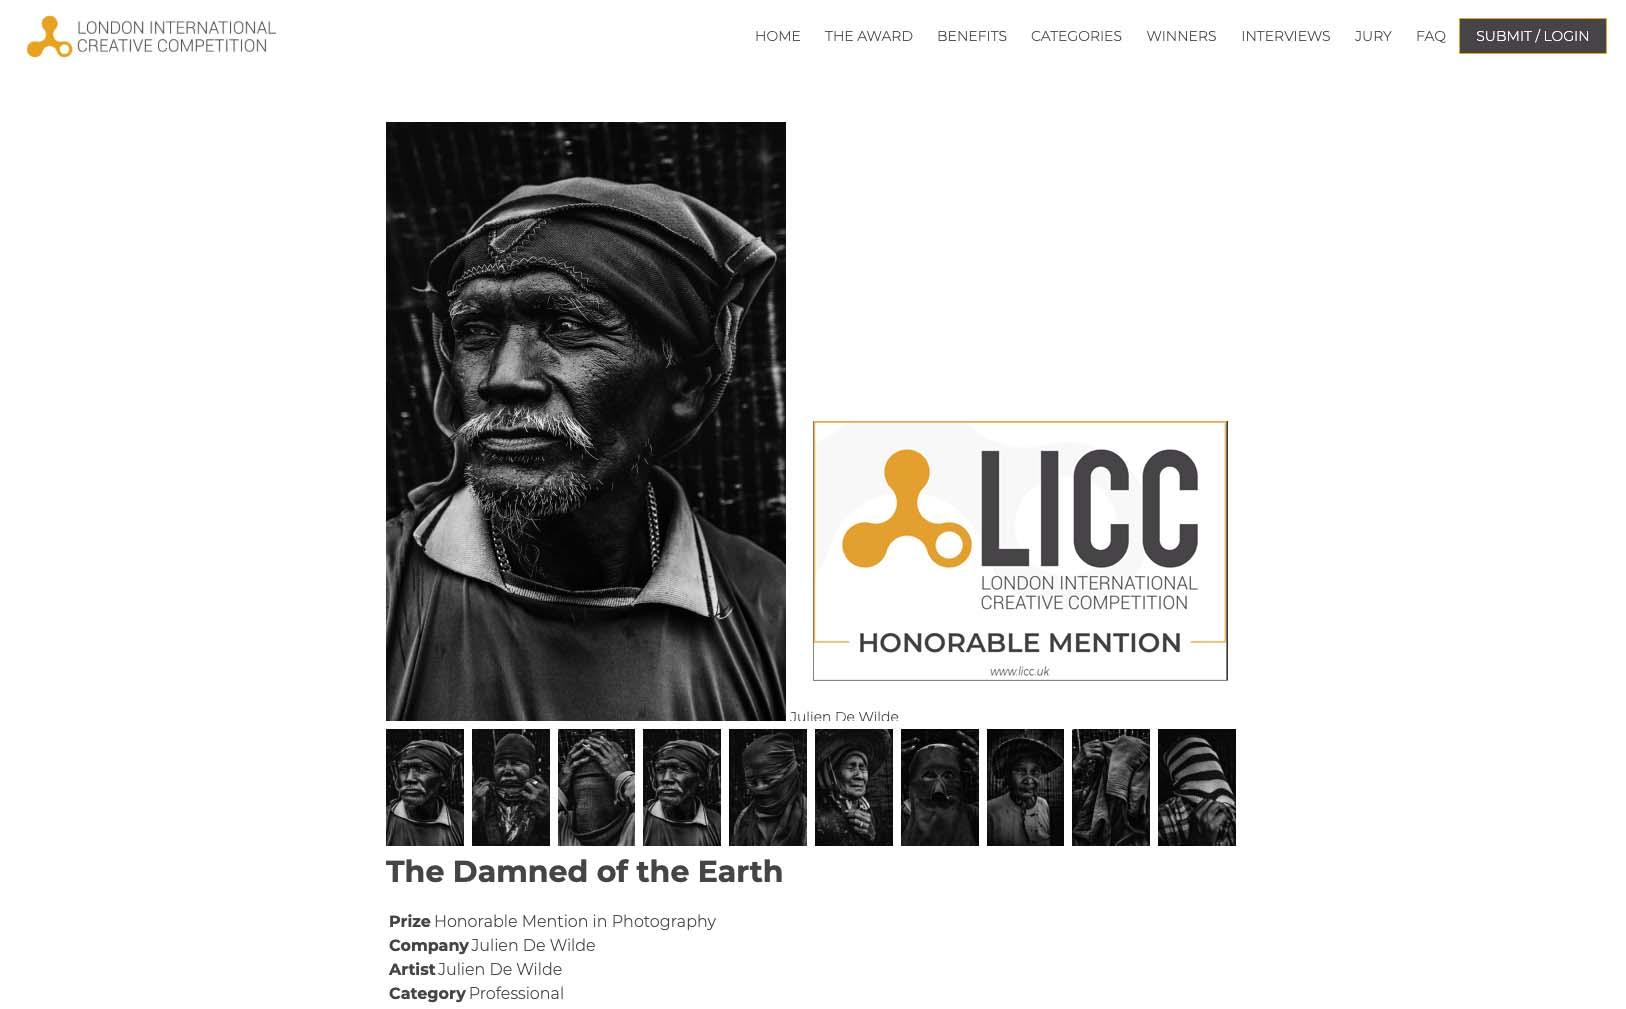 Julien De Wilde Photographer LICC London International Creative Competition